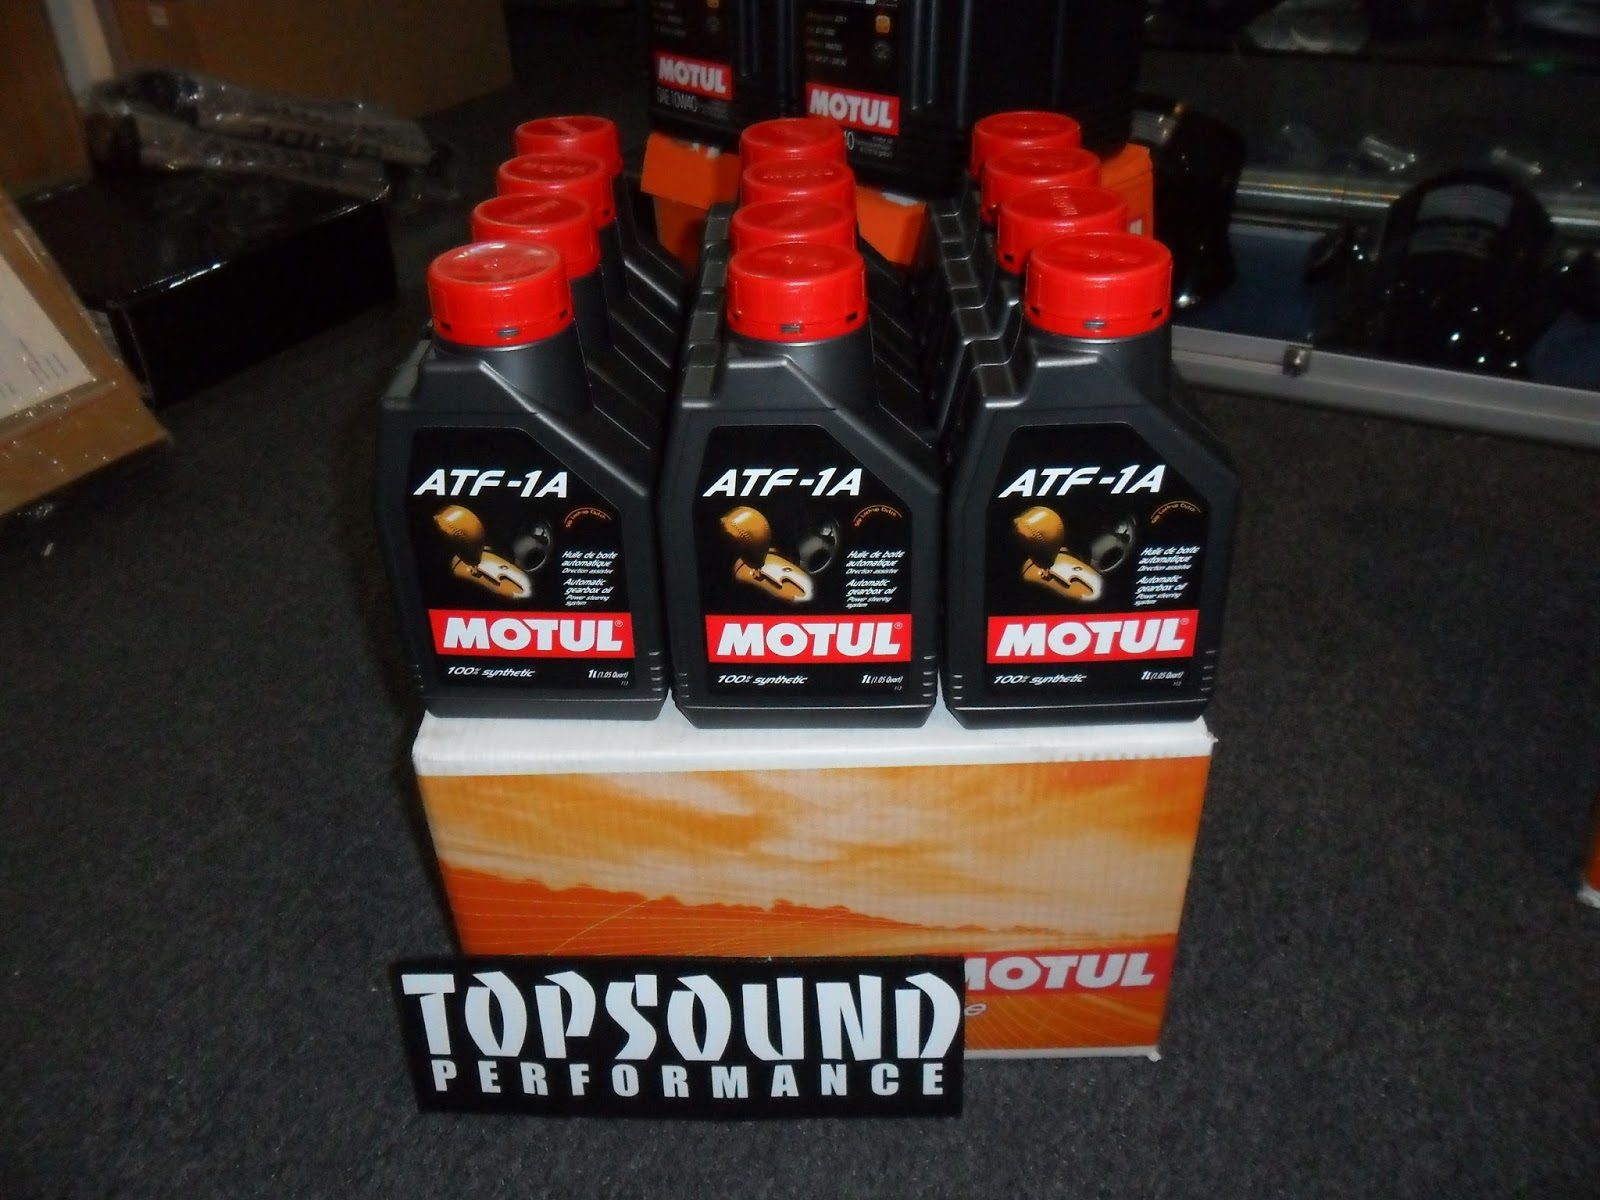 topsound performance motul atf 1a auto transmission oil. Black Bedroom Furniture Sets. Home Design Ideas